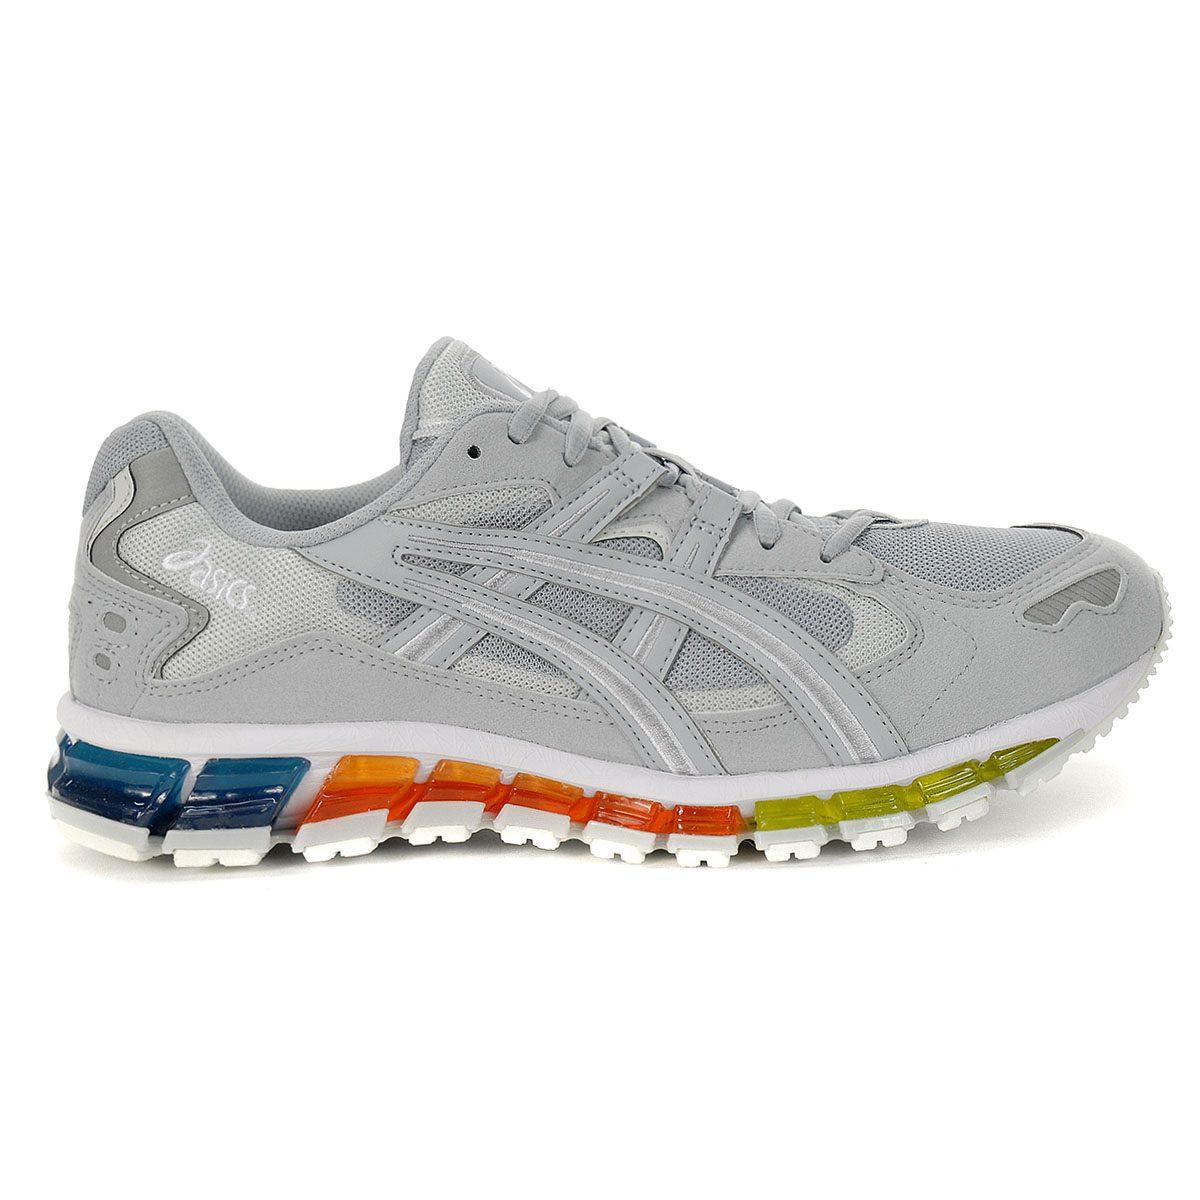 ASICS Mens OG Gel-Kayano 5 360 Piedmont Grey/Piedmont Grey Shoe ...